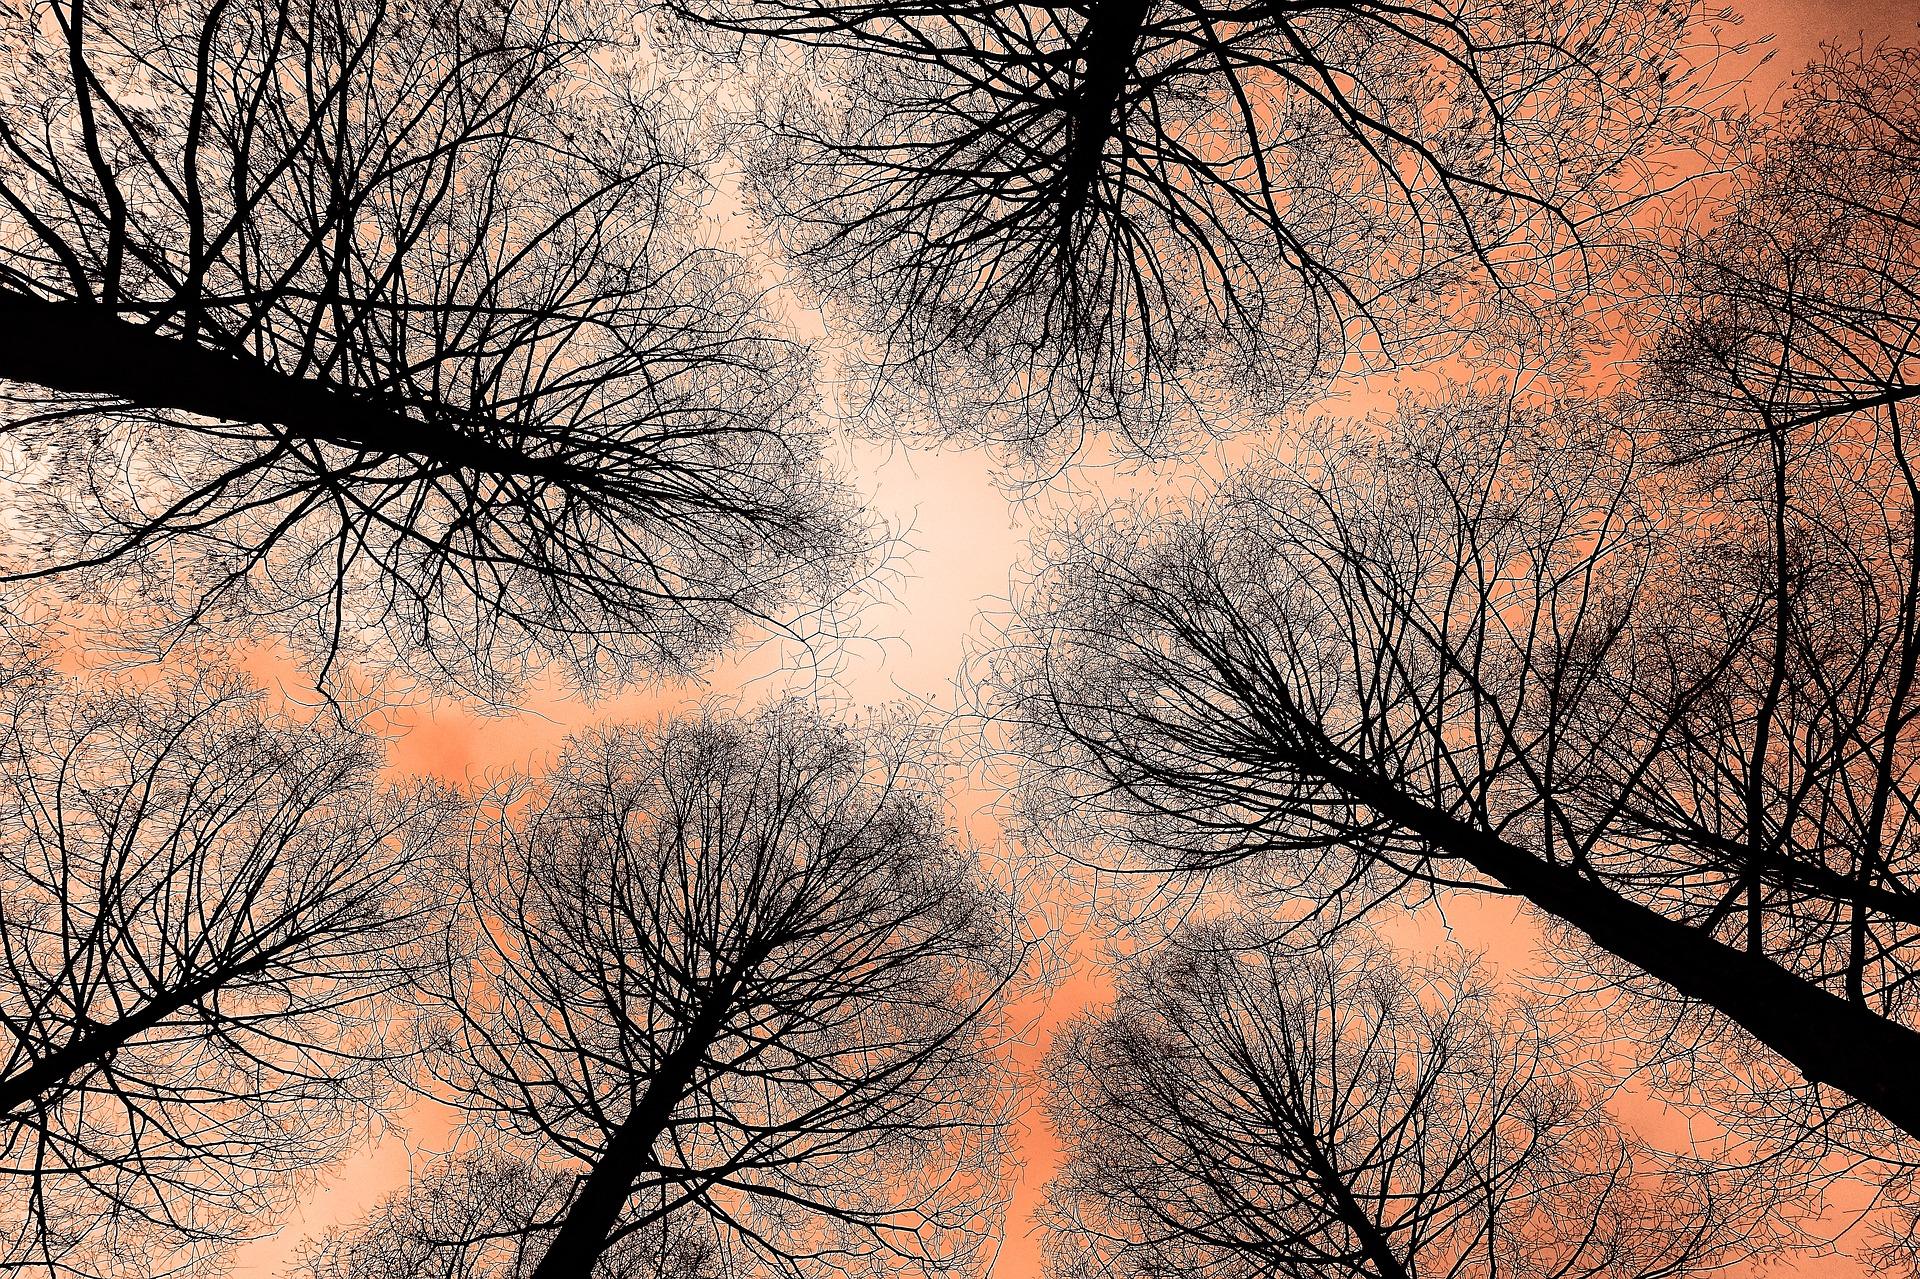 tree-3082795_1920